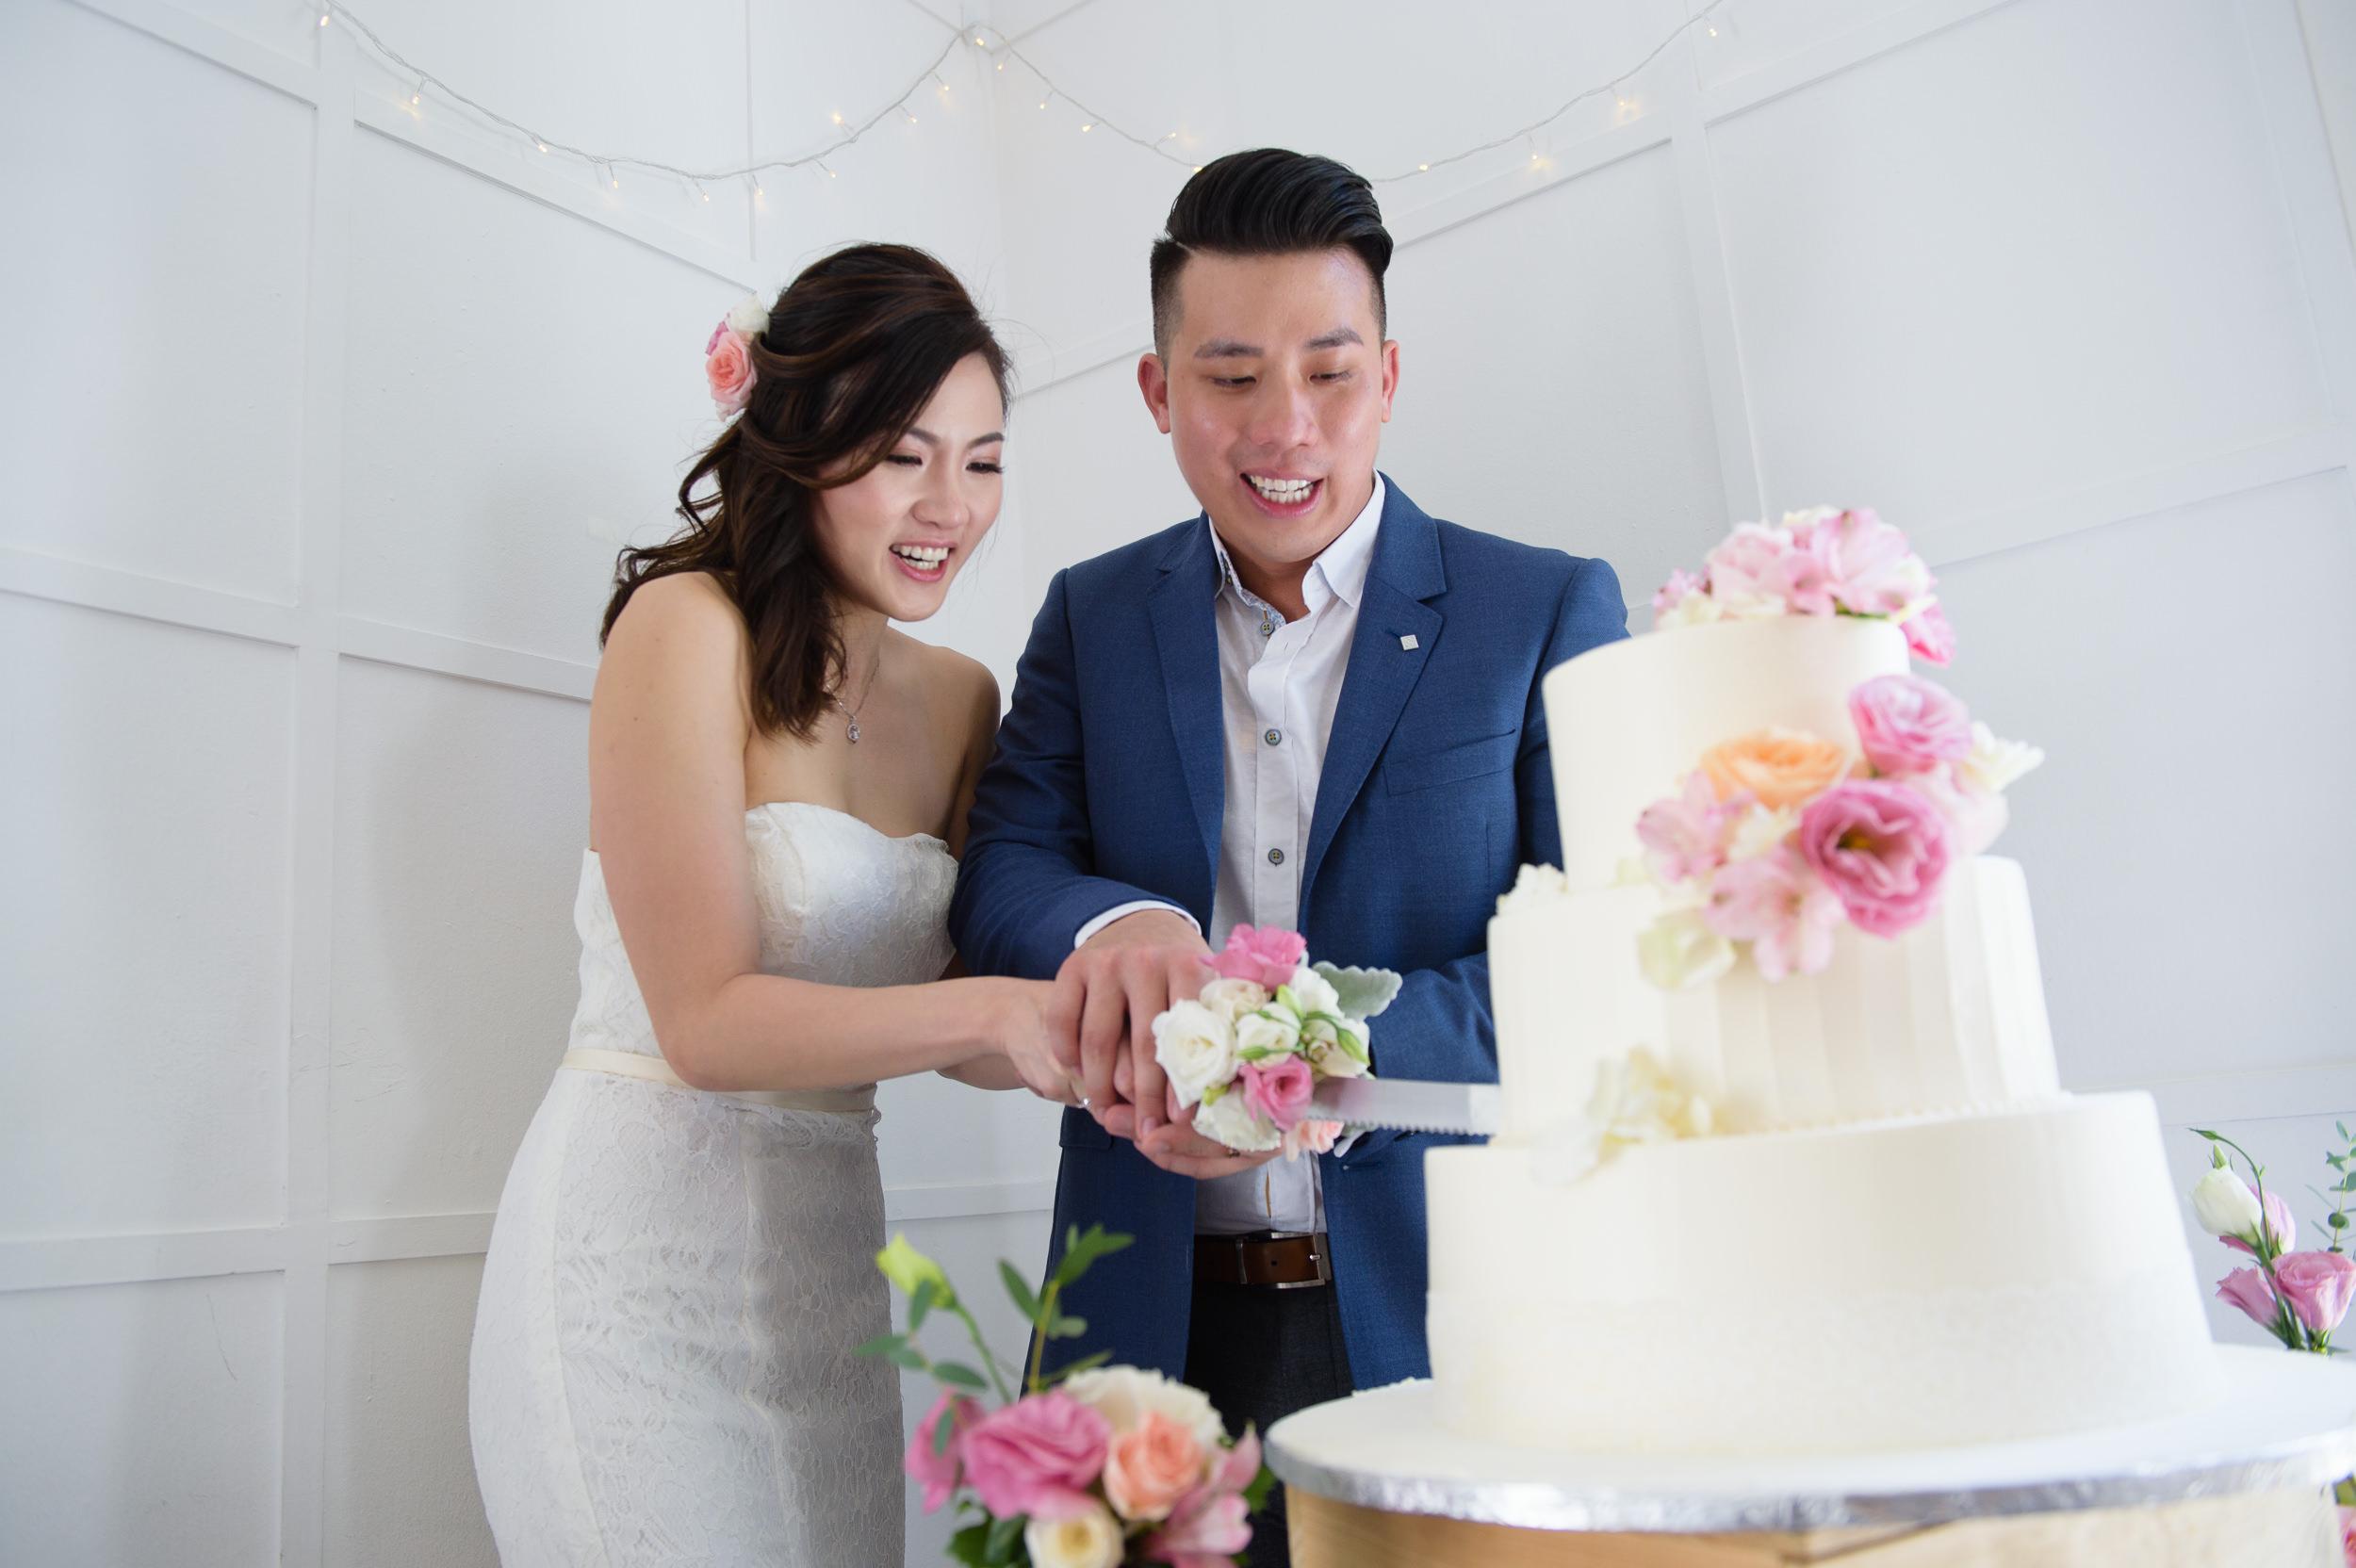 ROM Wedding Cake Cutting Bokelicious Photography